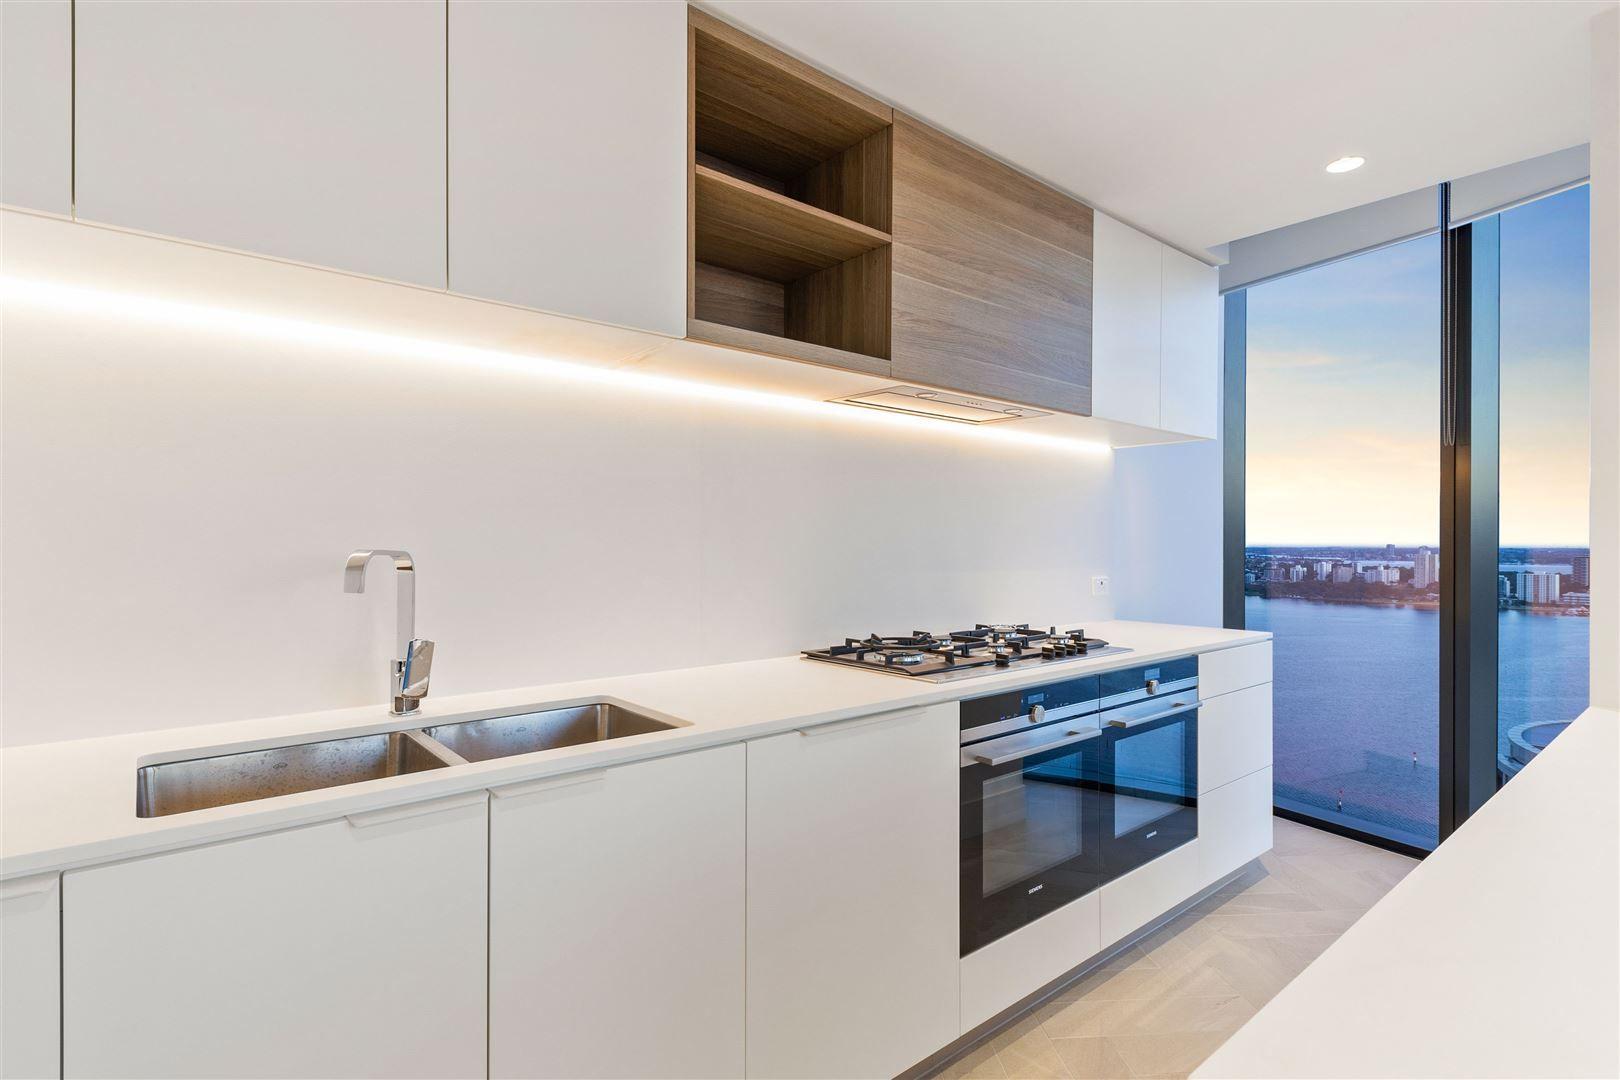 4 bedrooms Apartment / Unit / Flat in 2605/1 Geoffrey Bolton Avenue PERTH WA, 6000